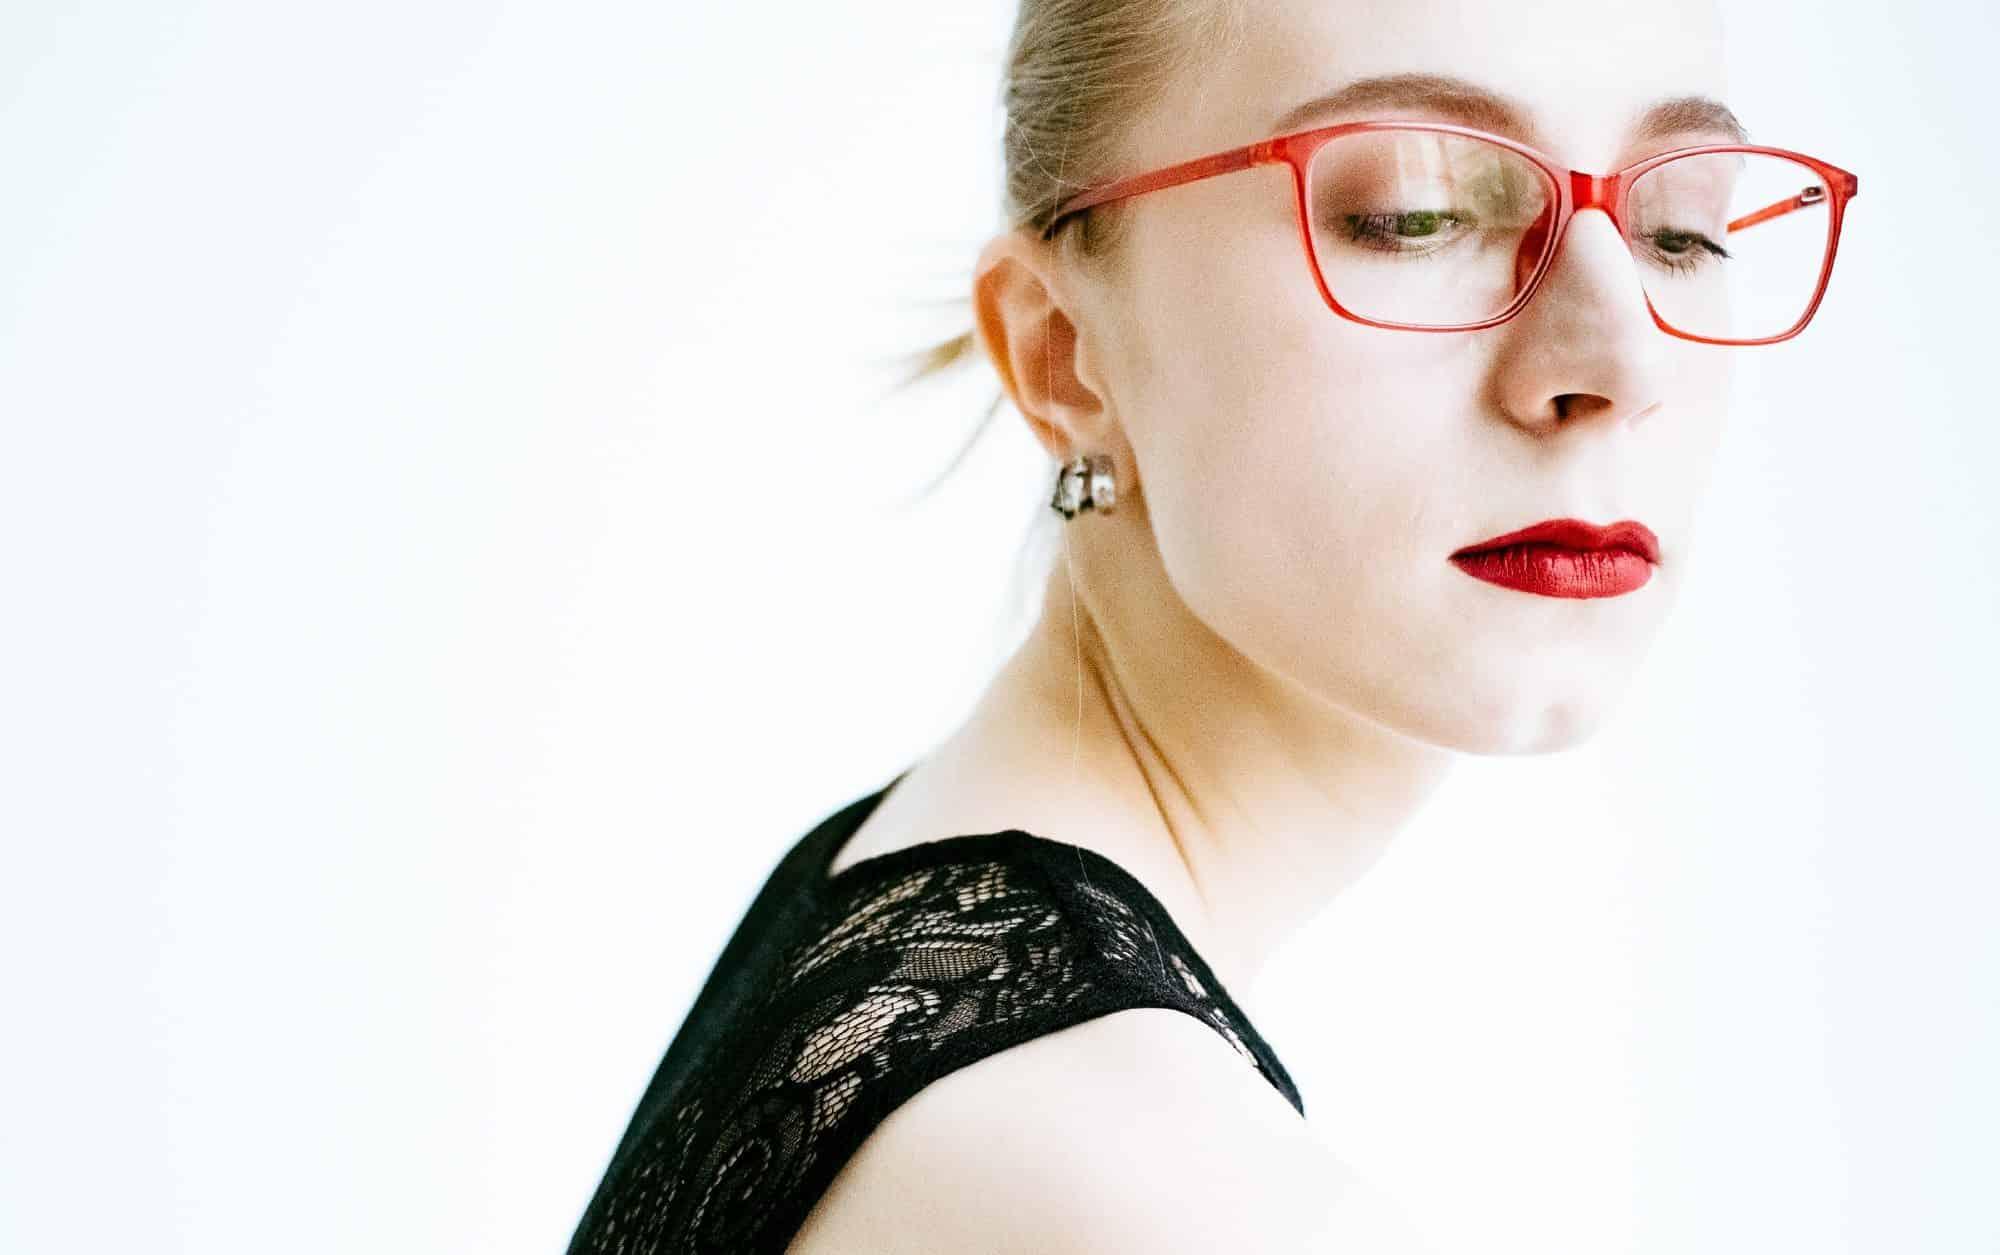 Портрет Ирины Куземко, интерсекс-активистки.